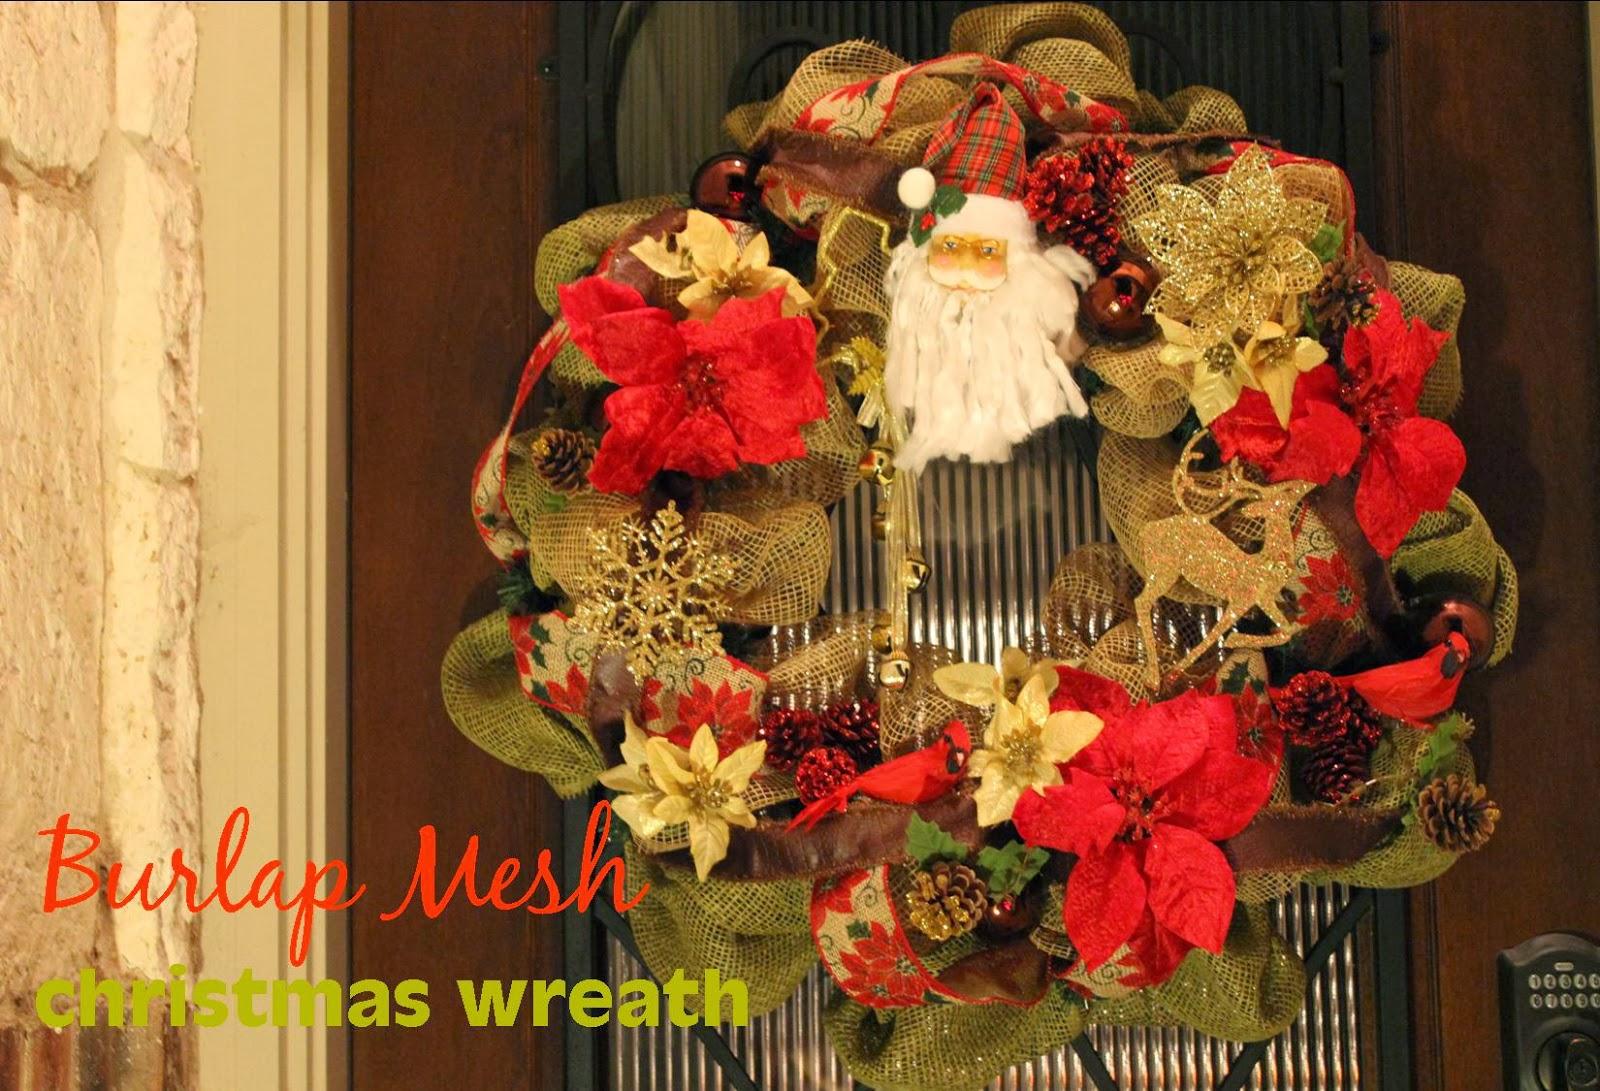 diy burlap mesh christmas wreath - How To Make A Christmas Wreath With Mesh